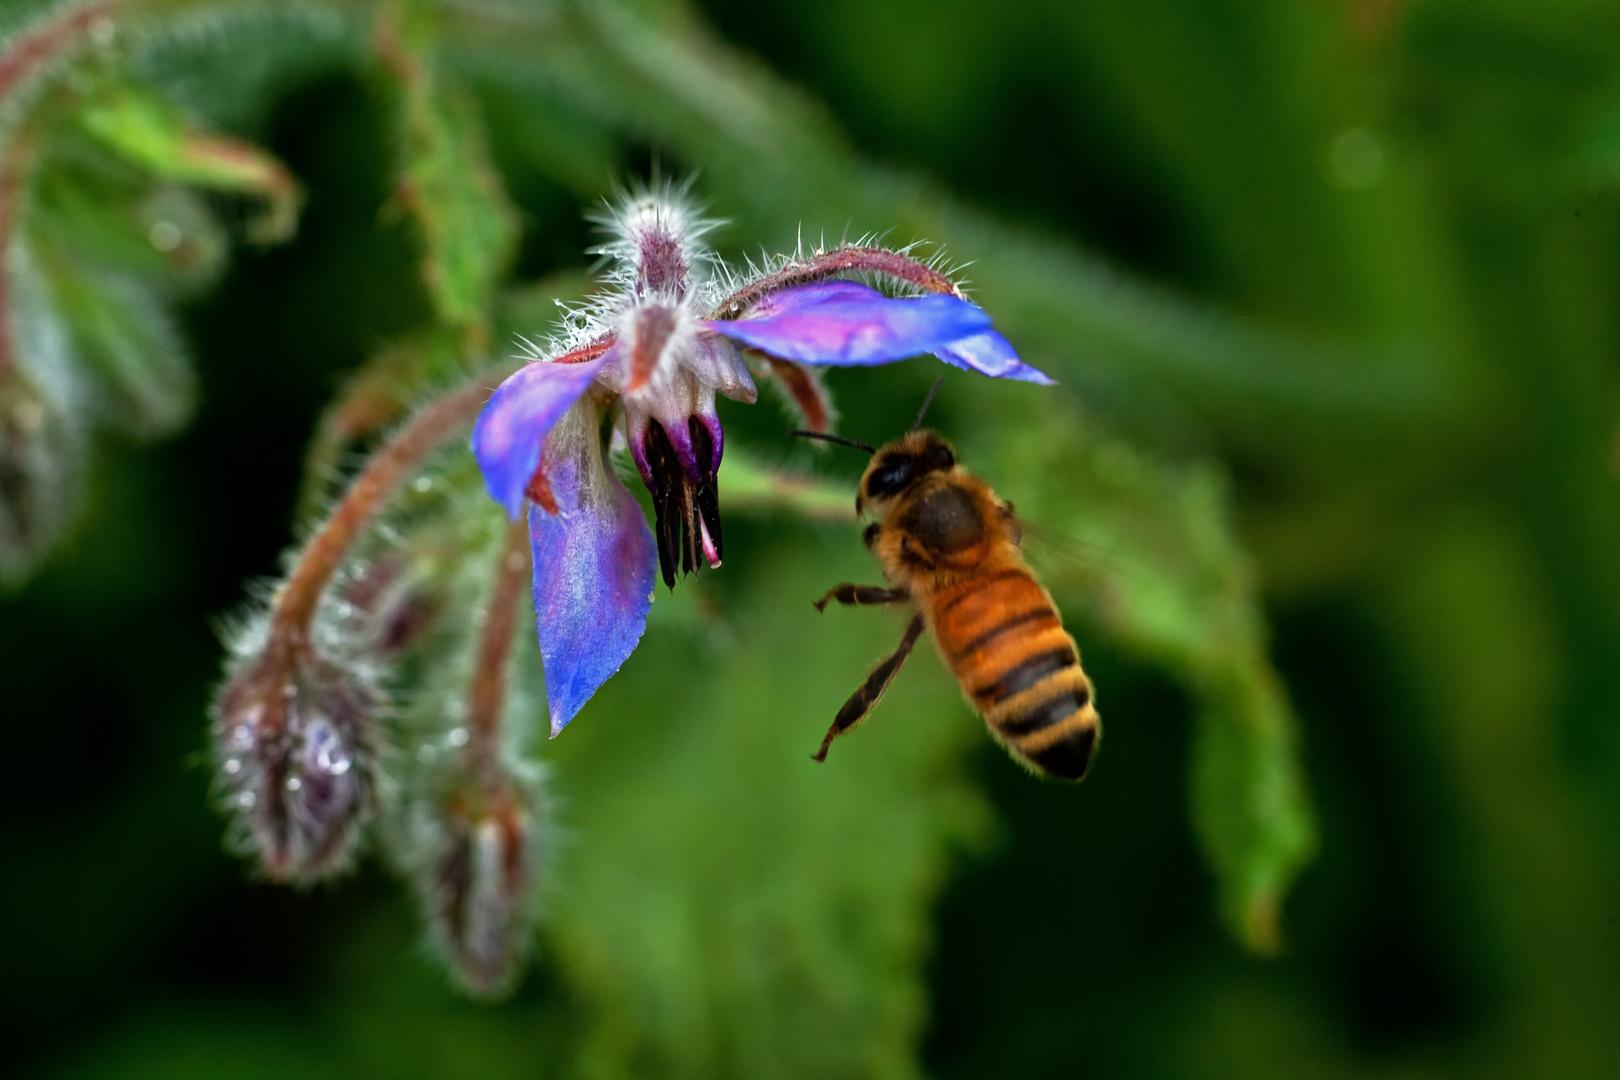 Insekt im Anflug